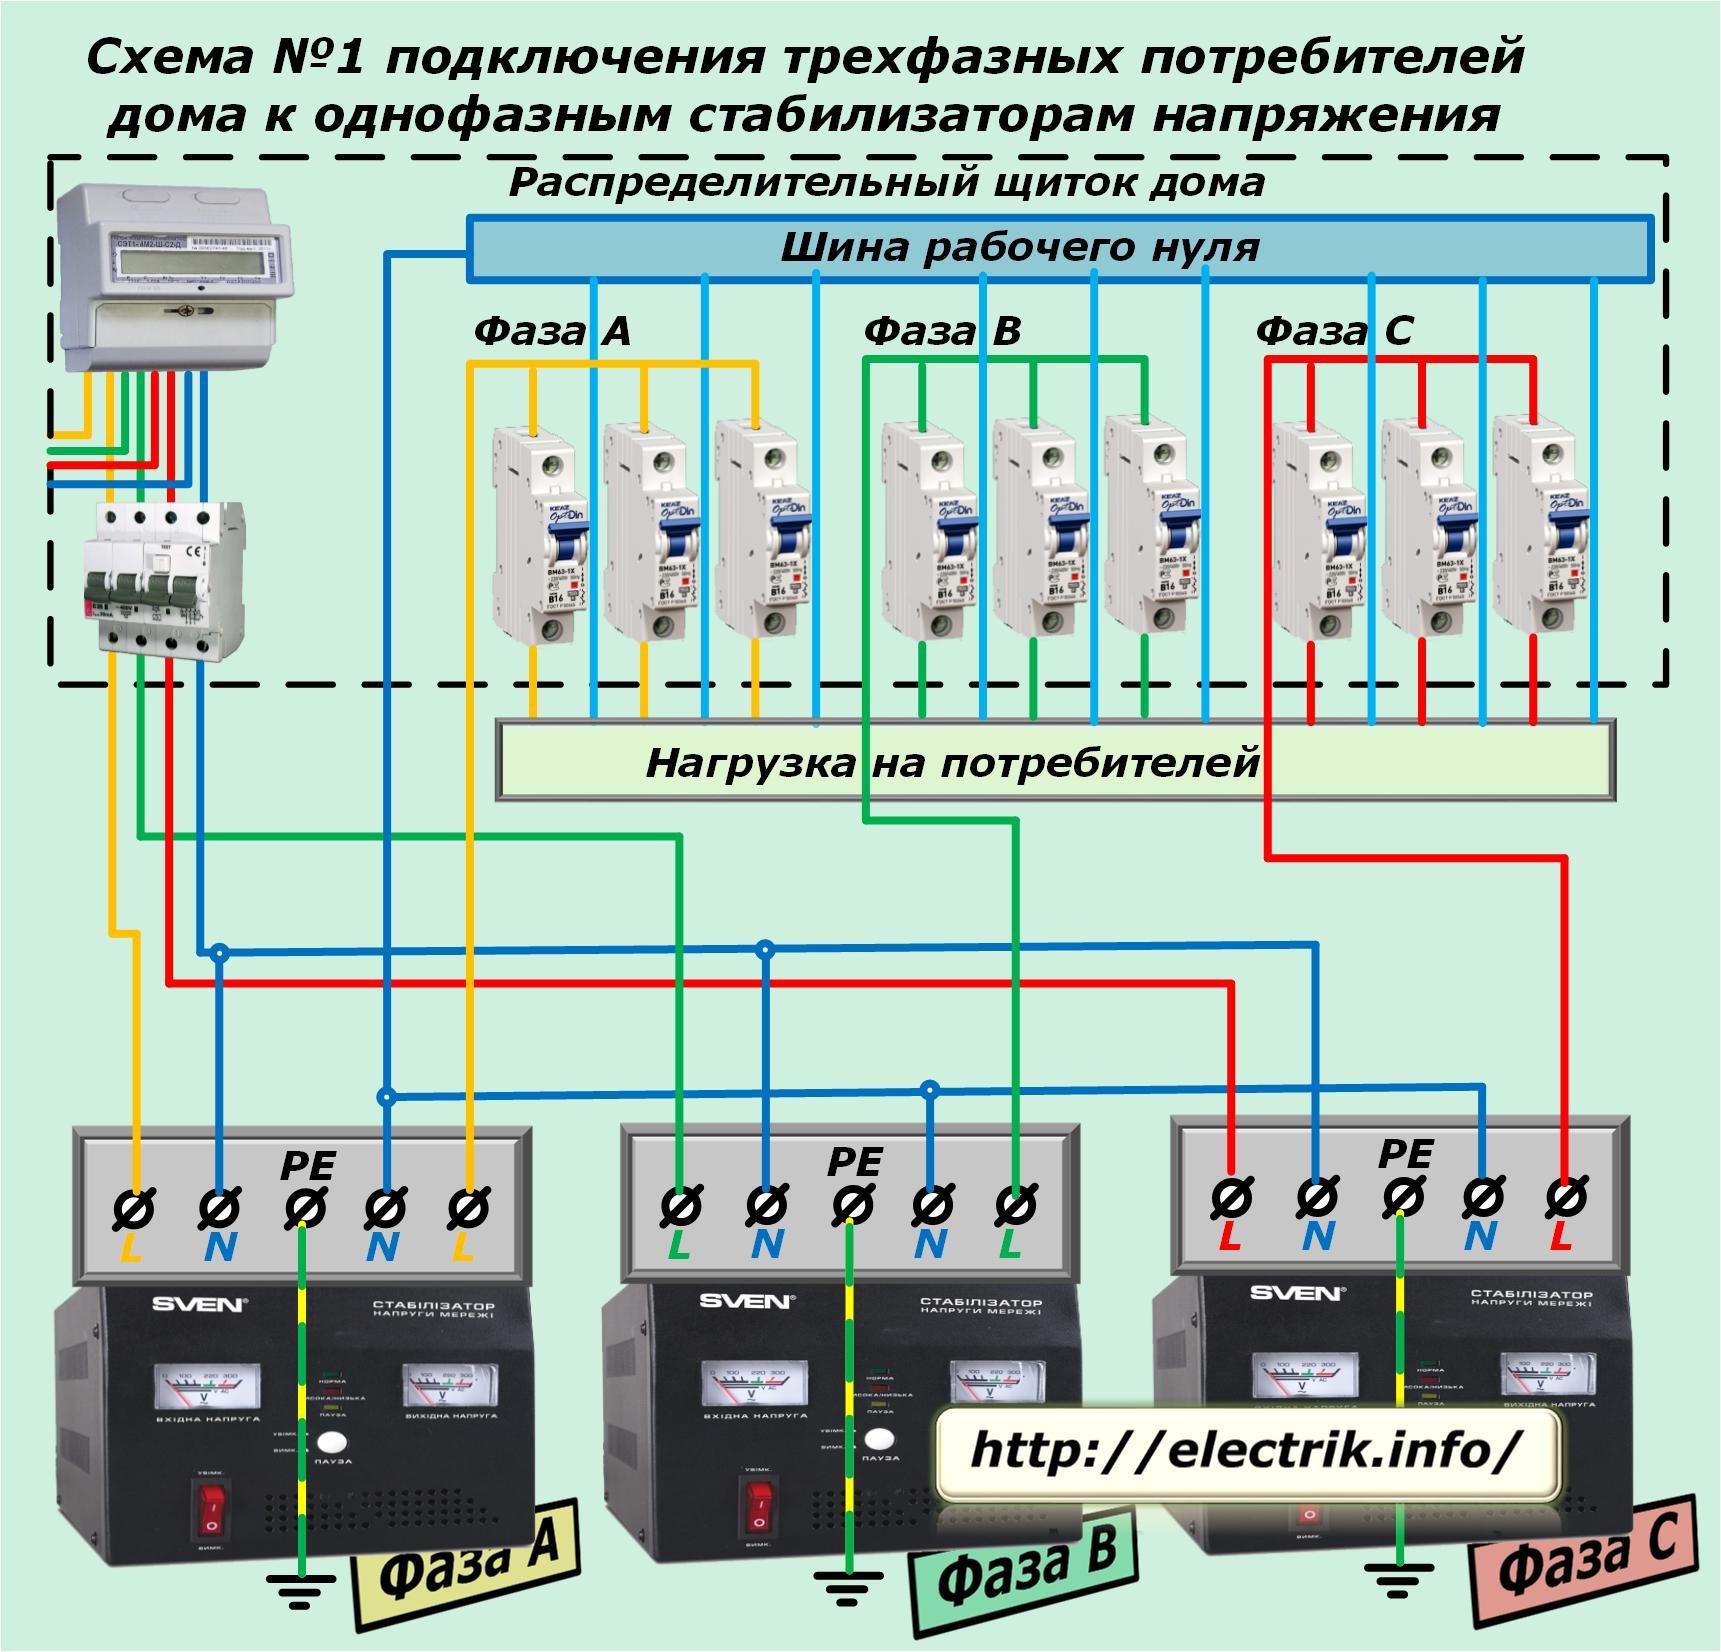 Ограничитель мощности ом-630, монтаж на din-рейке 35 мм